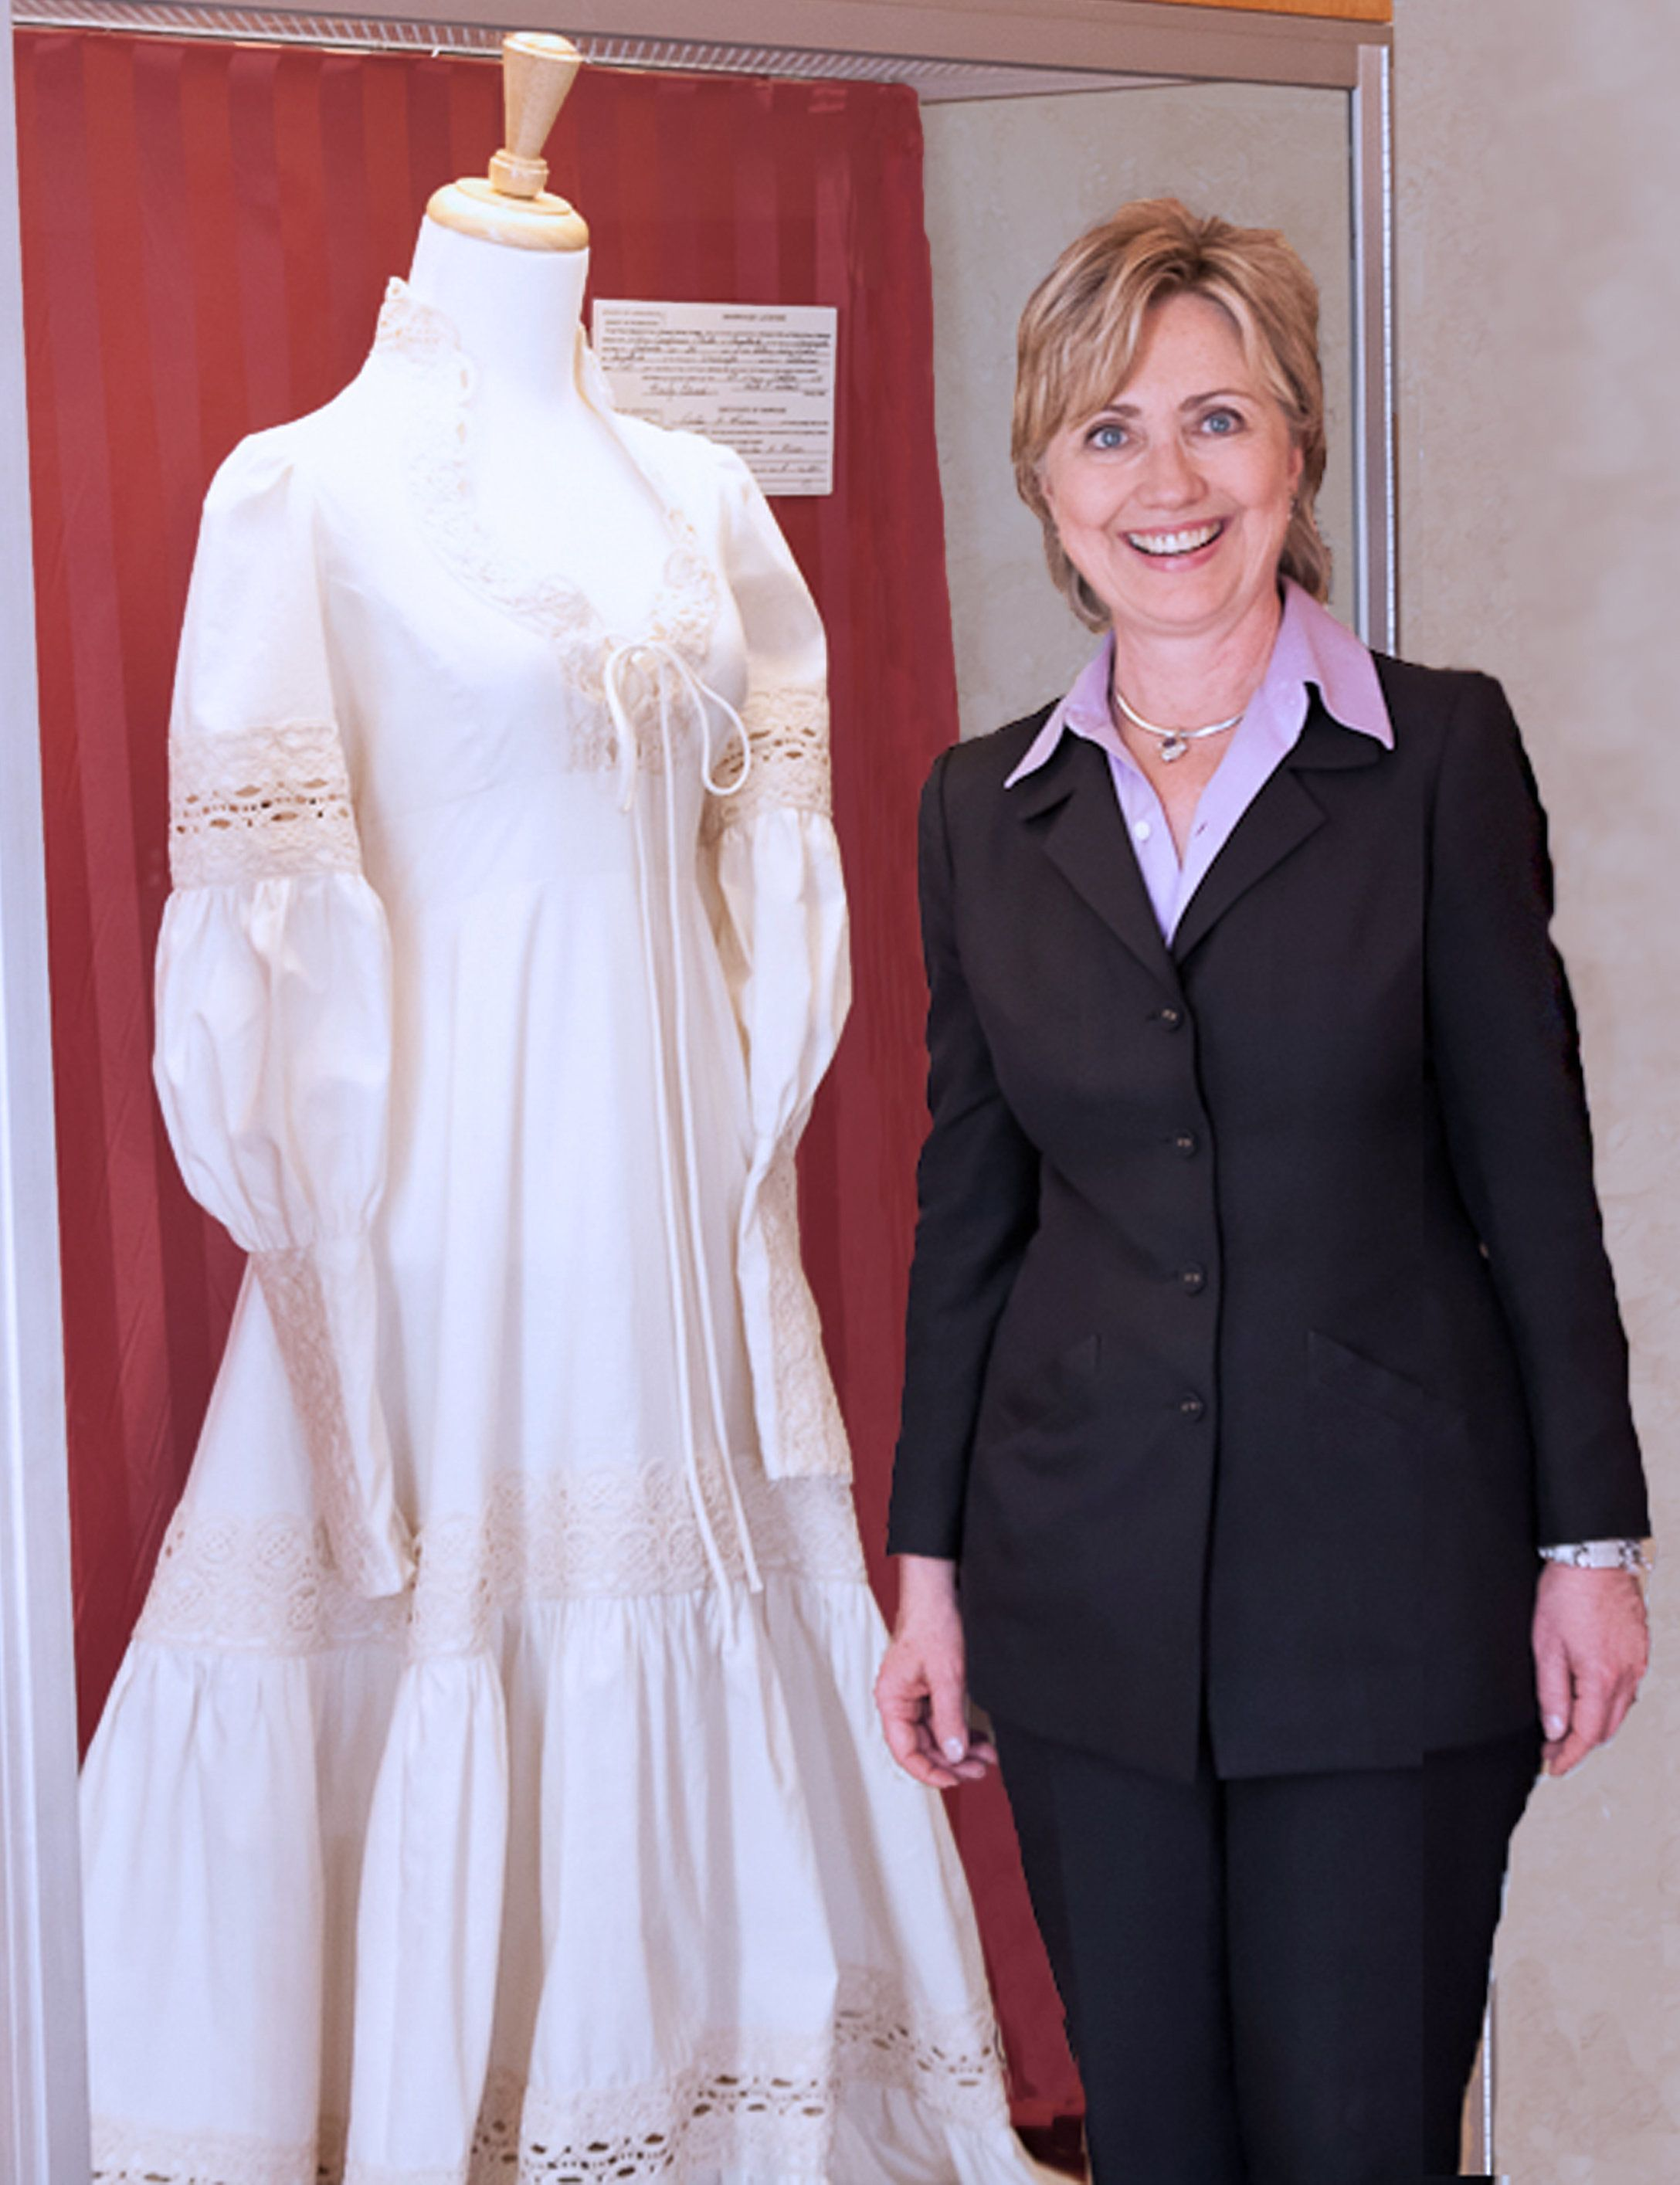 Charmant The Dress: